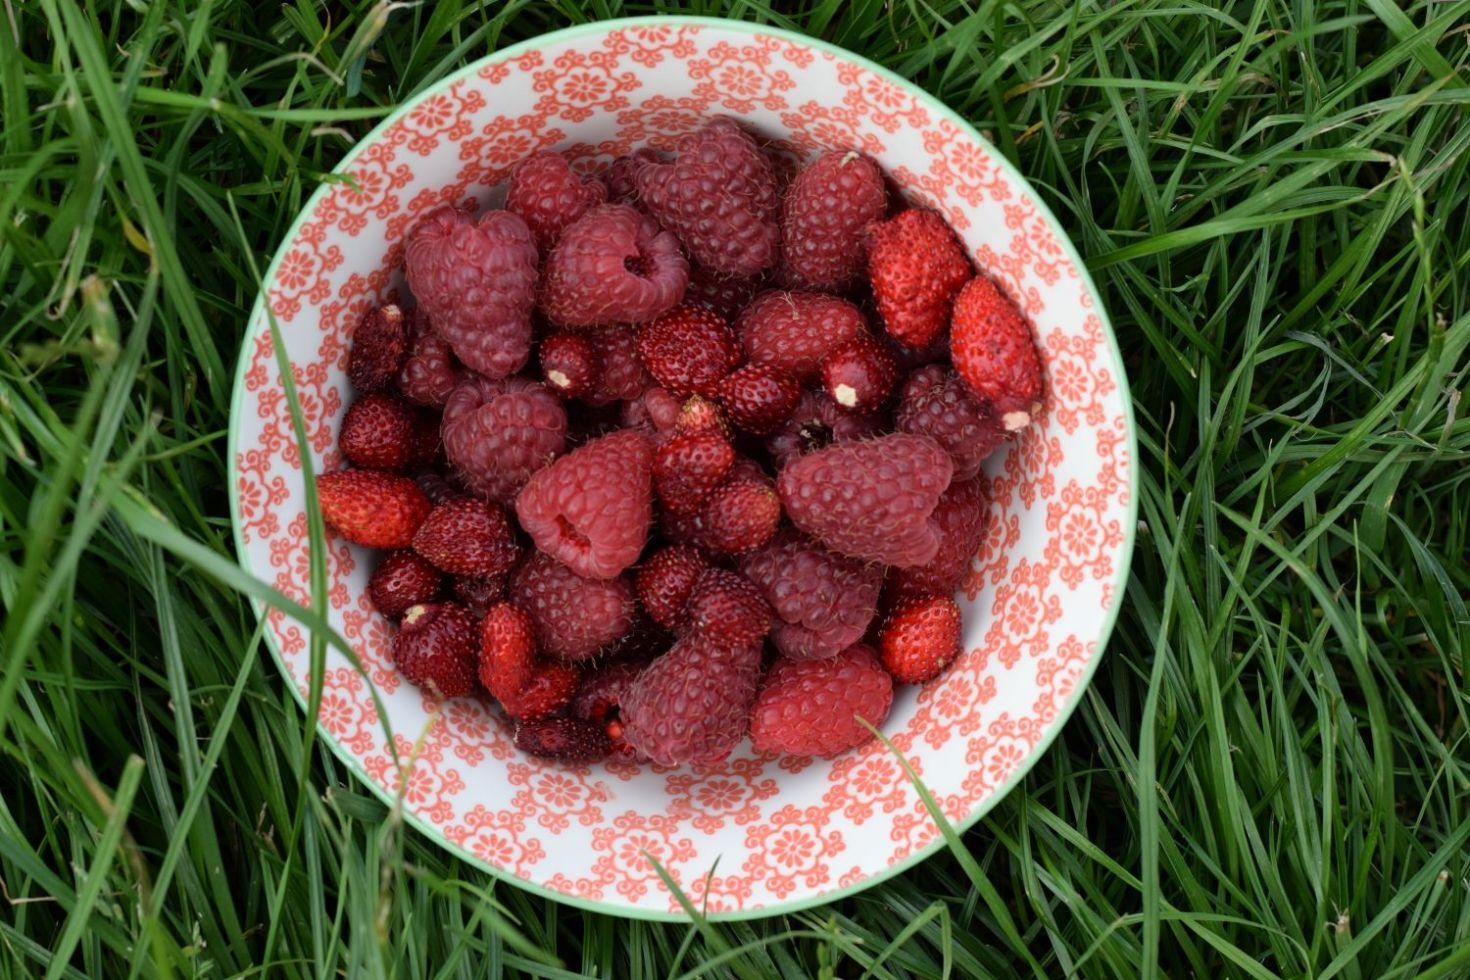 bowl of Raspberries and alpine strawberries